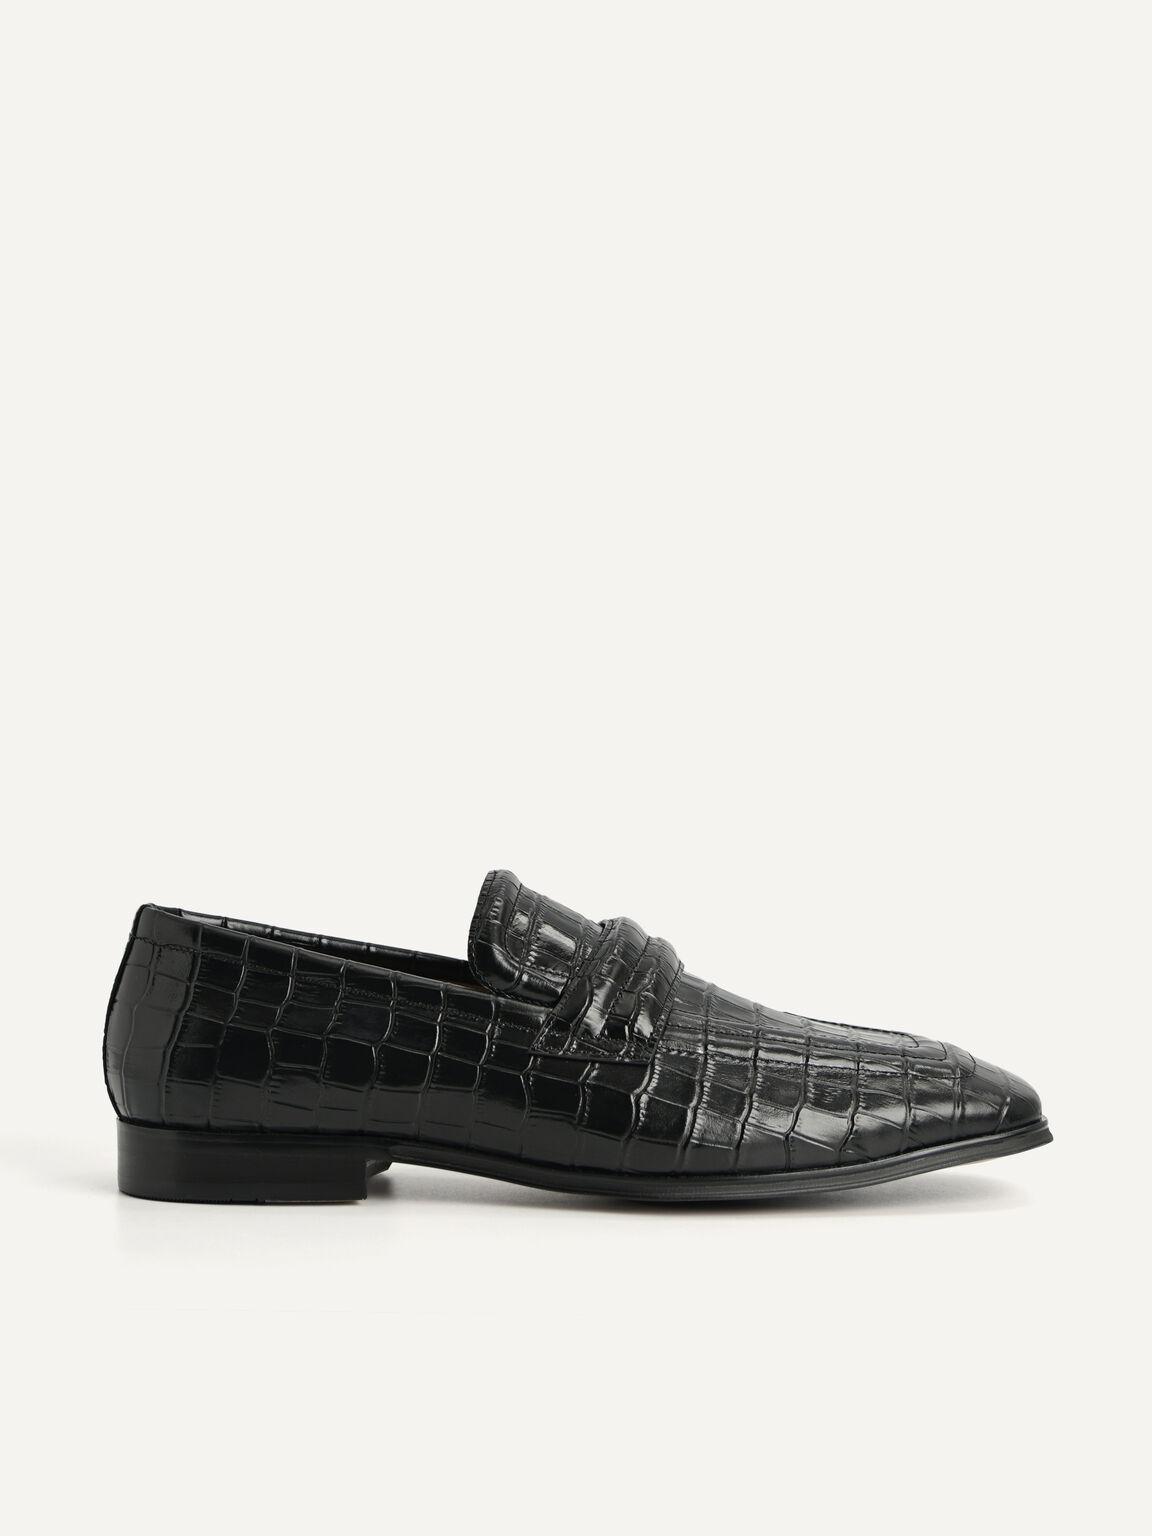 Croc-Effect Leather Loafers, Black, hi-res